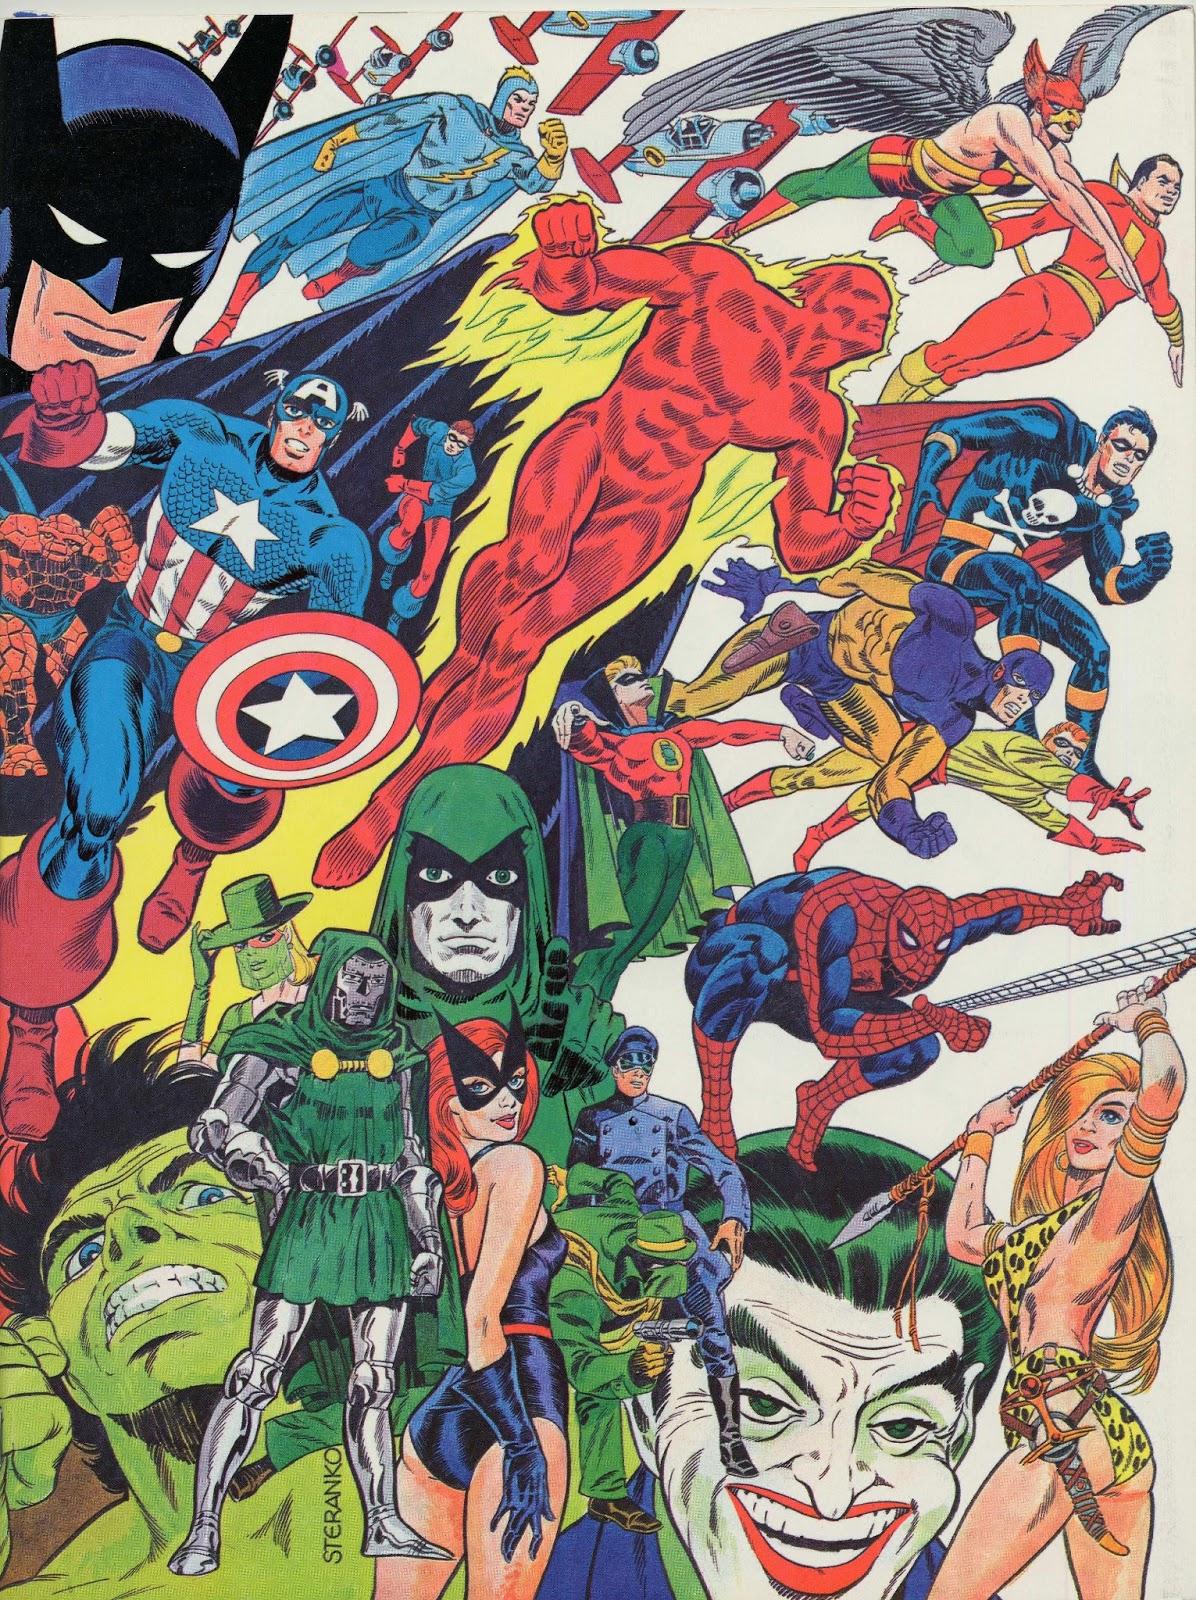 Cap'n's Comics: The History of Comics by Jim Steranko